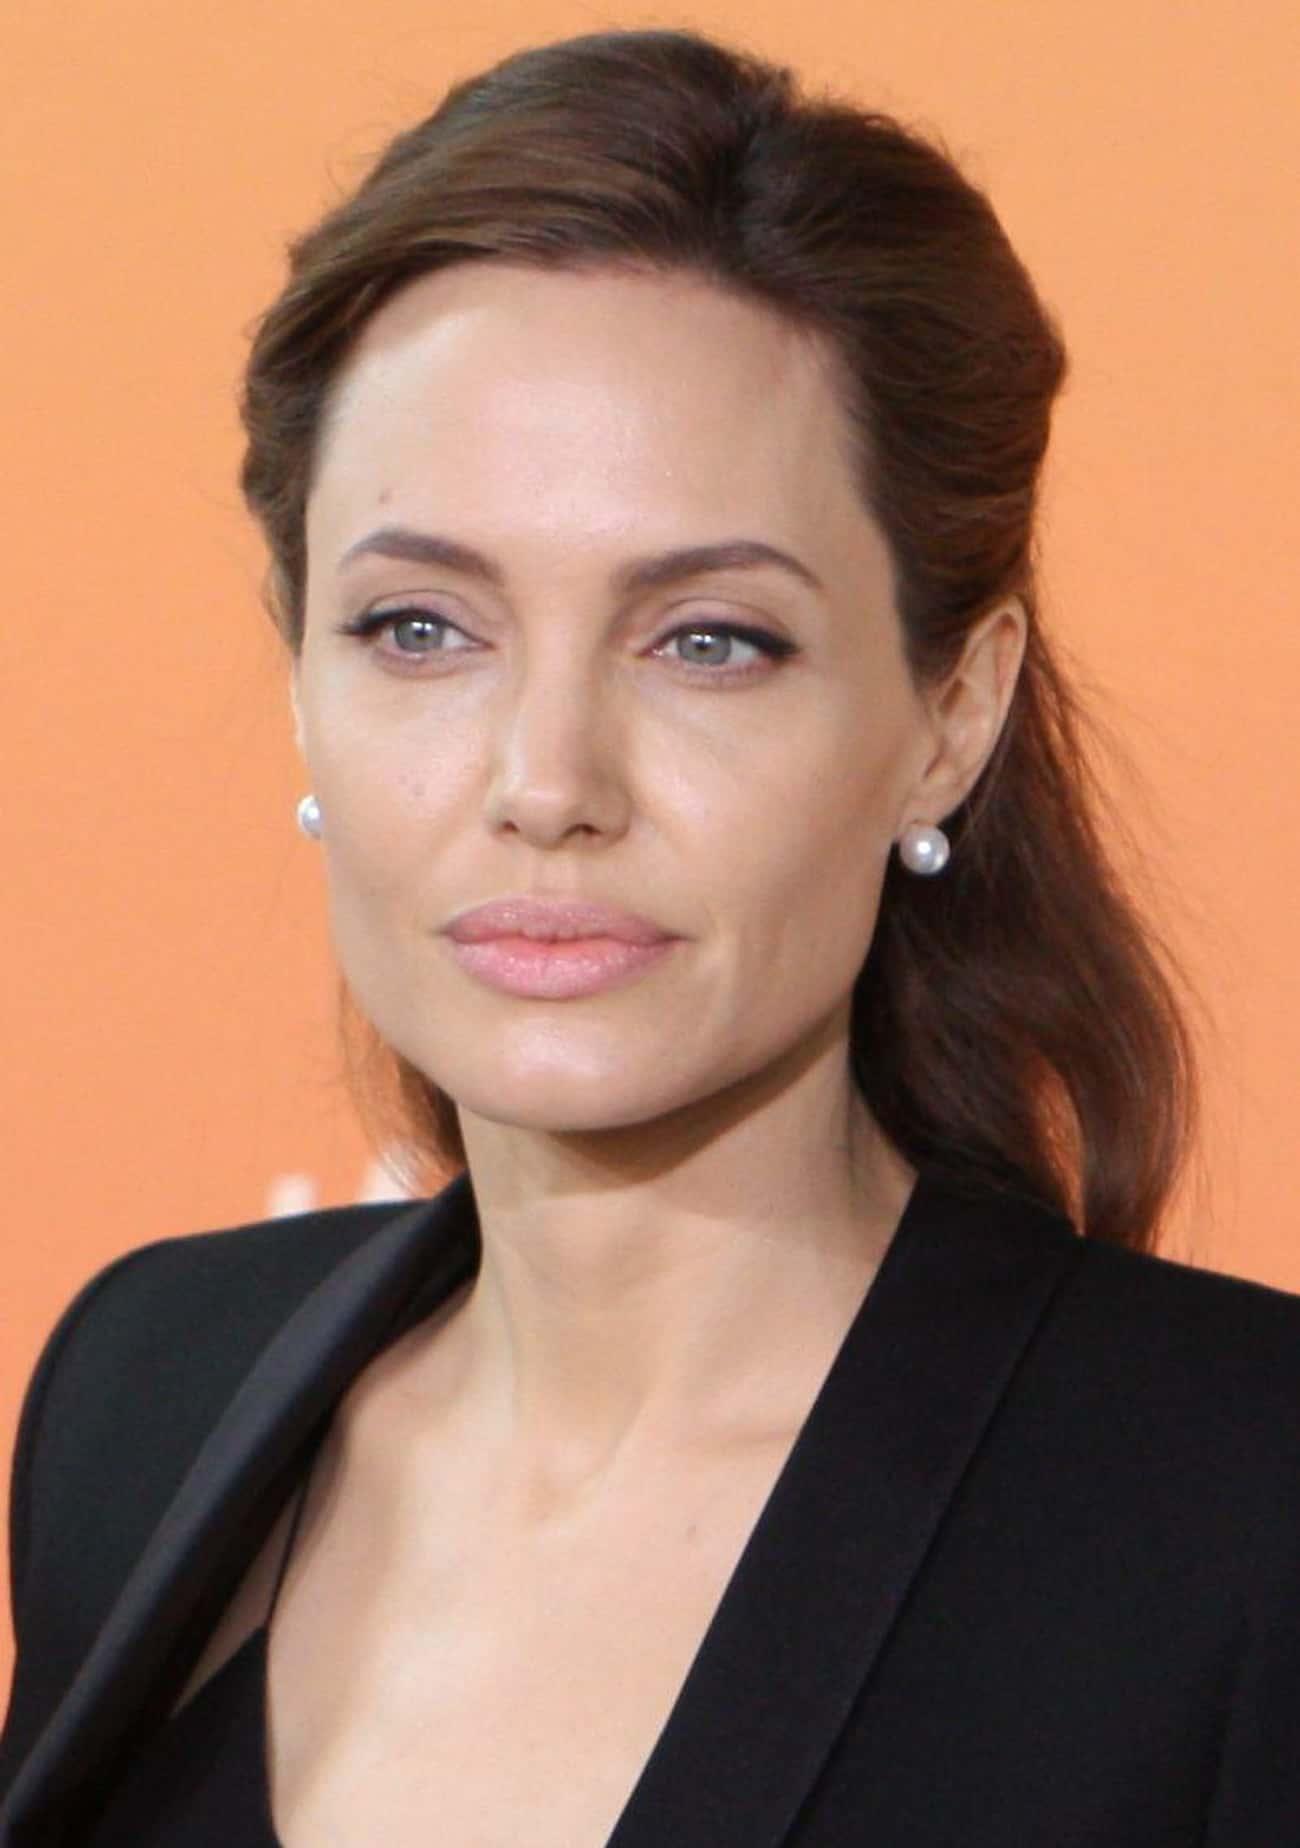 Angelina Jolie Wears A Vial Of Blood Around Her Neck